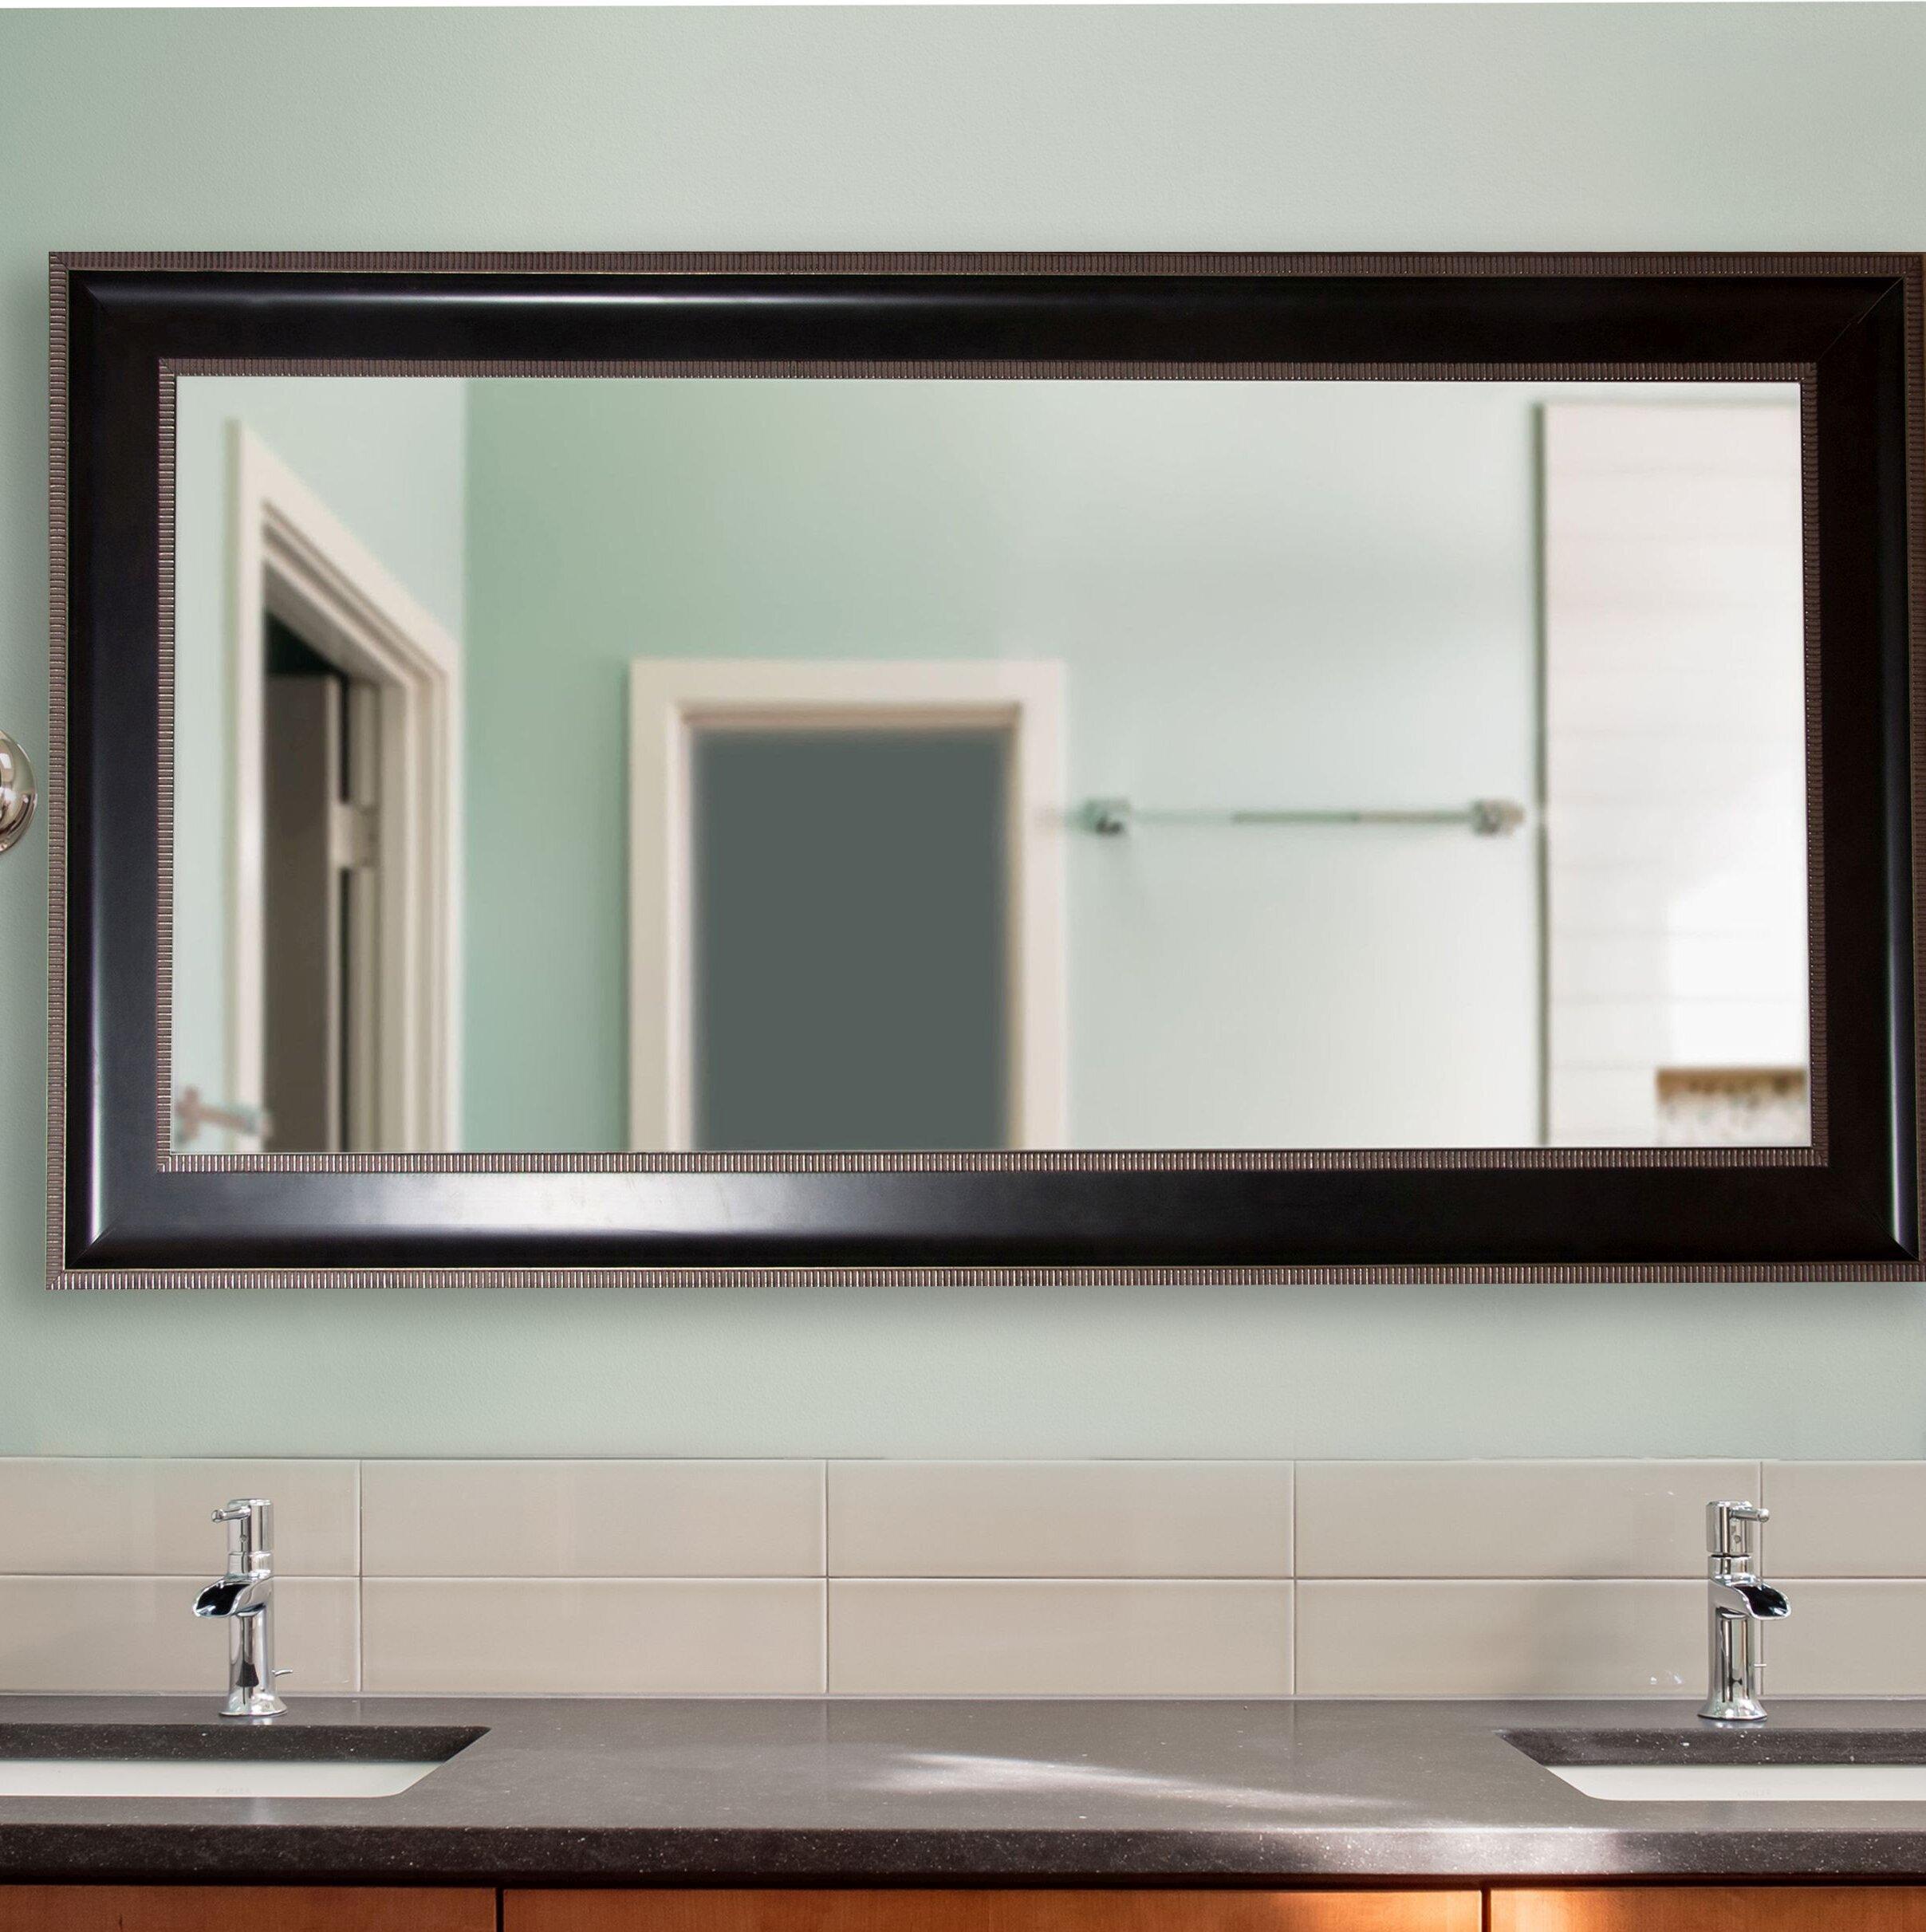 Black Charlton Home Vanity Mirrors You Ll Love In 2021 Wayfair